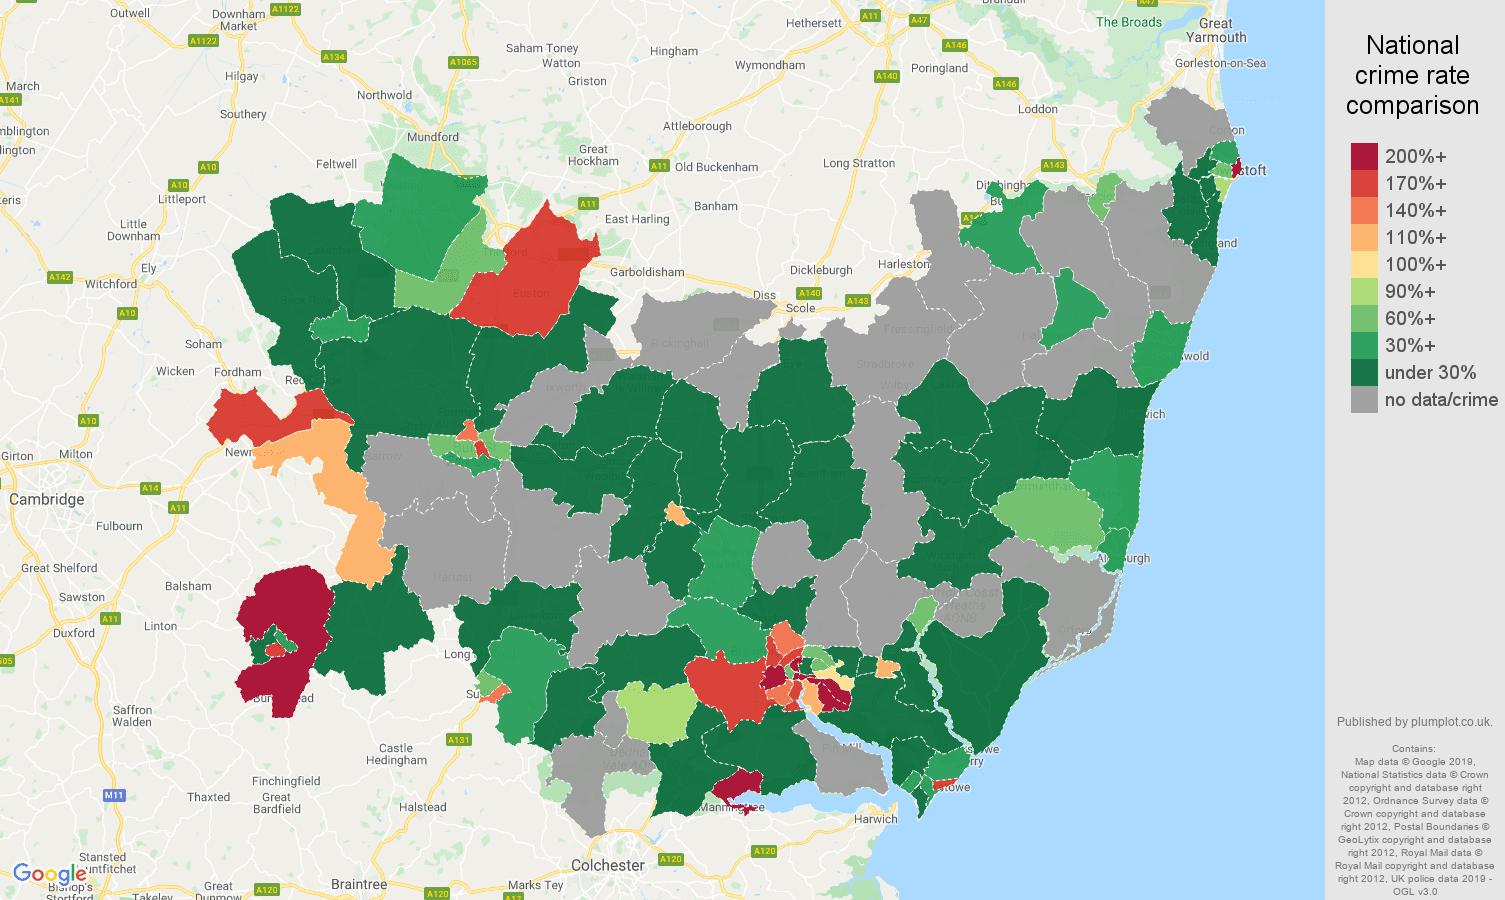 Suffolk shoplifting crime rate comparison map